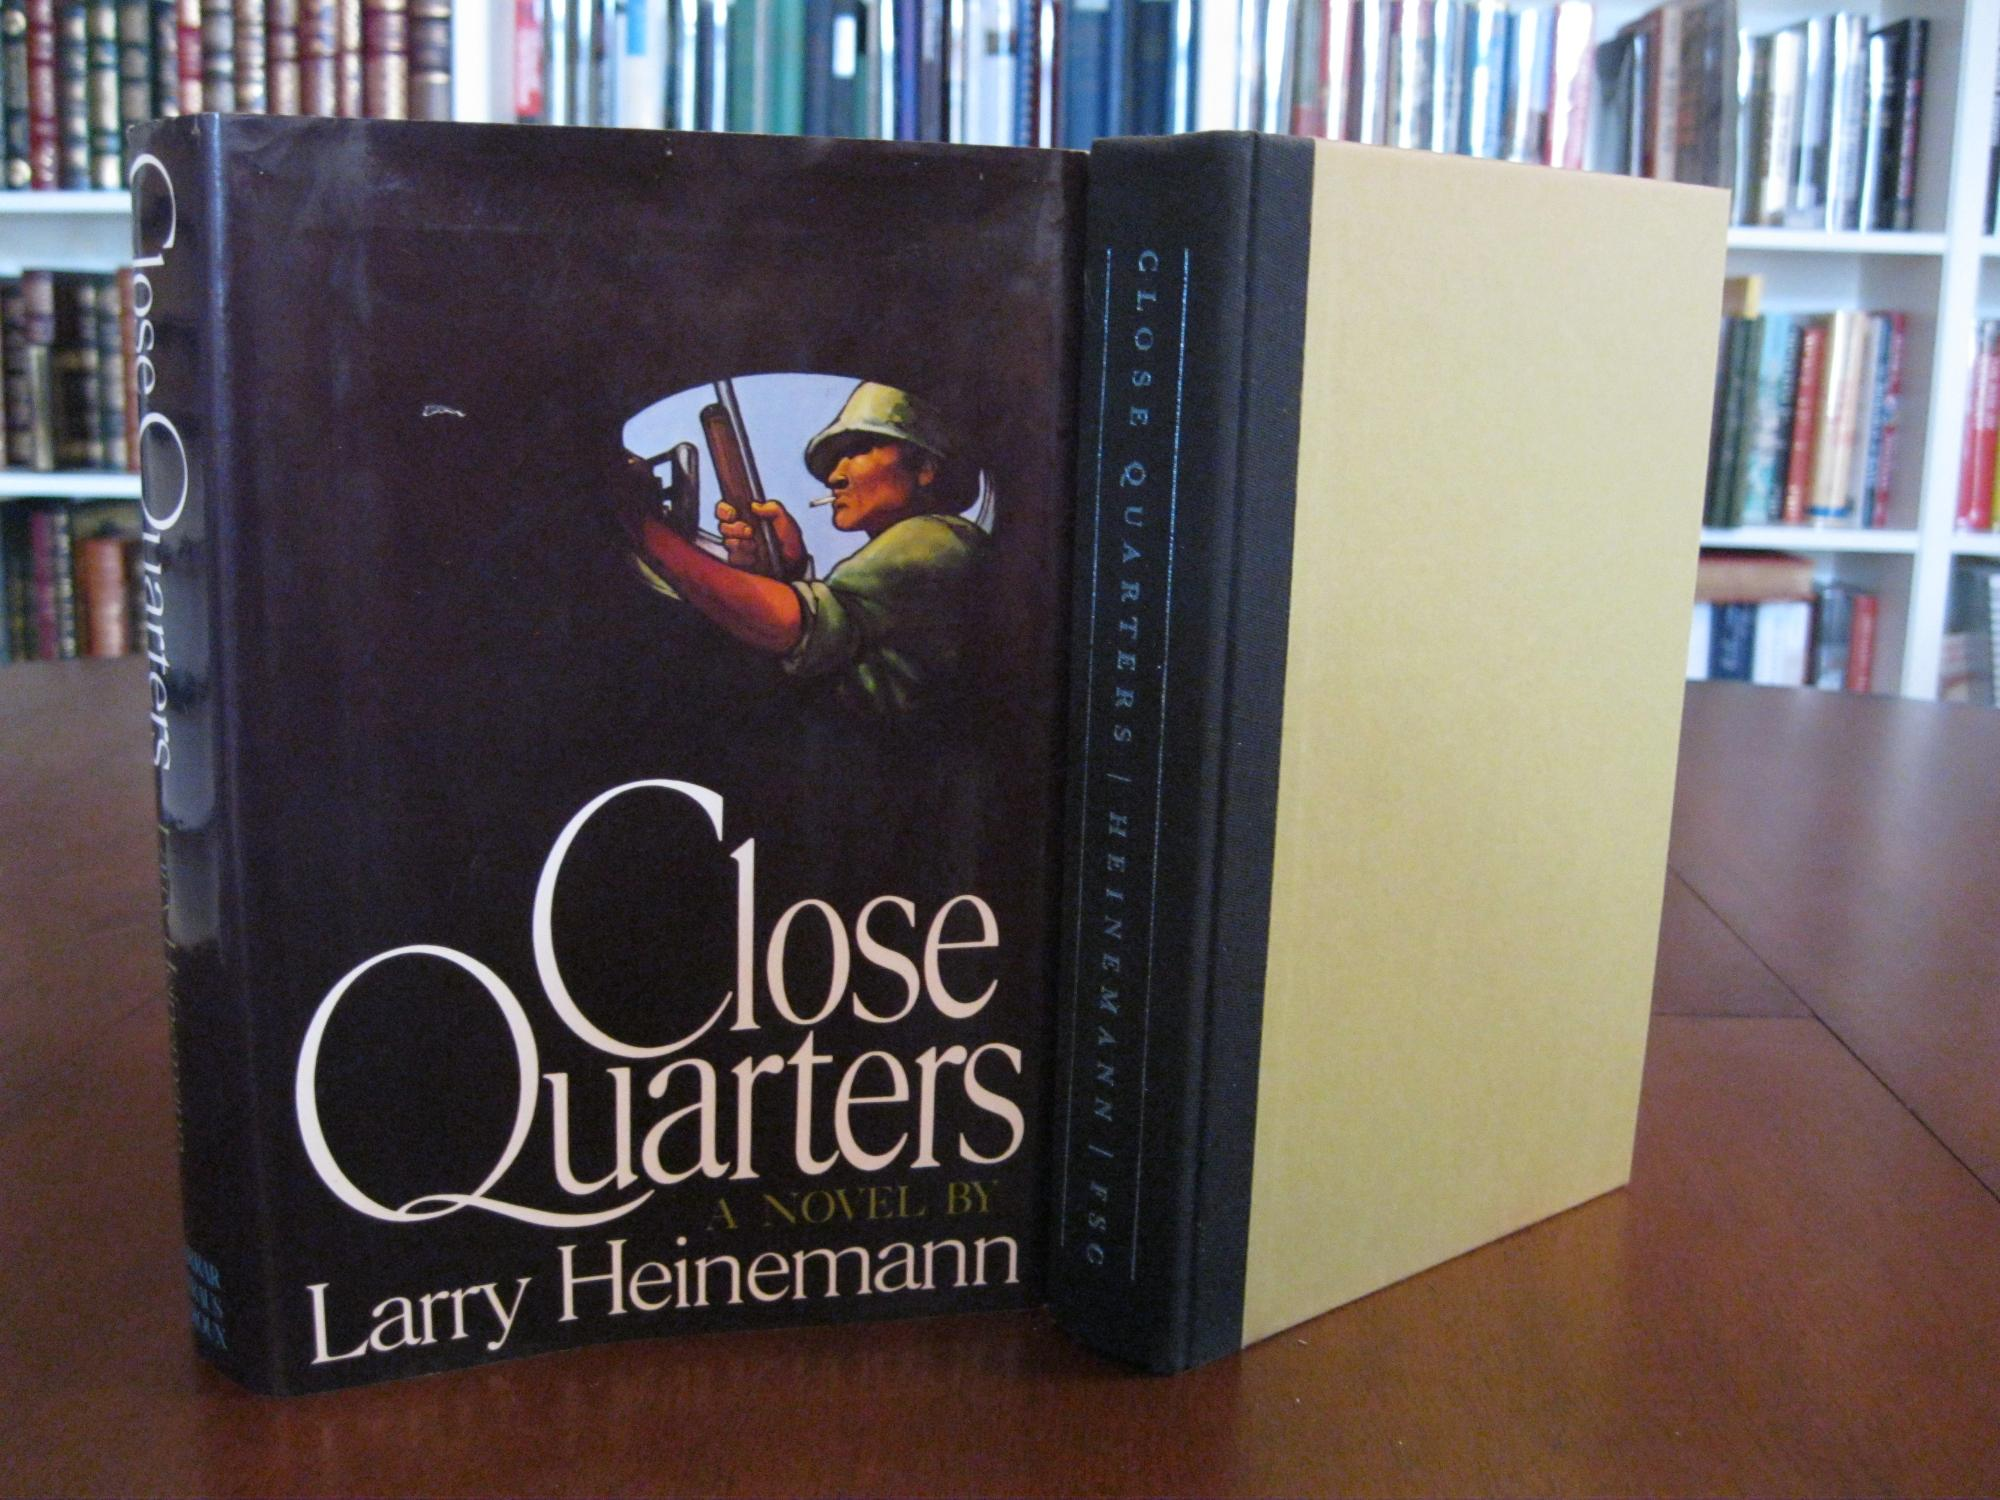 CLOSE_QUARTERS_HEINEMANN_LARRY_Very_Good_Hardcover